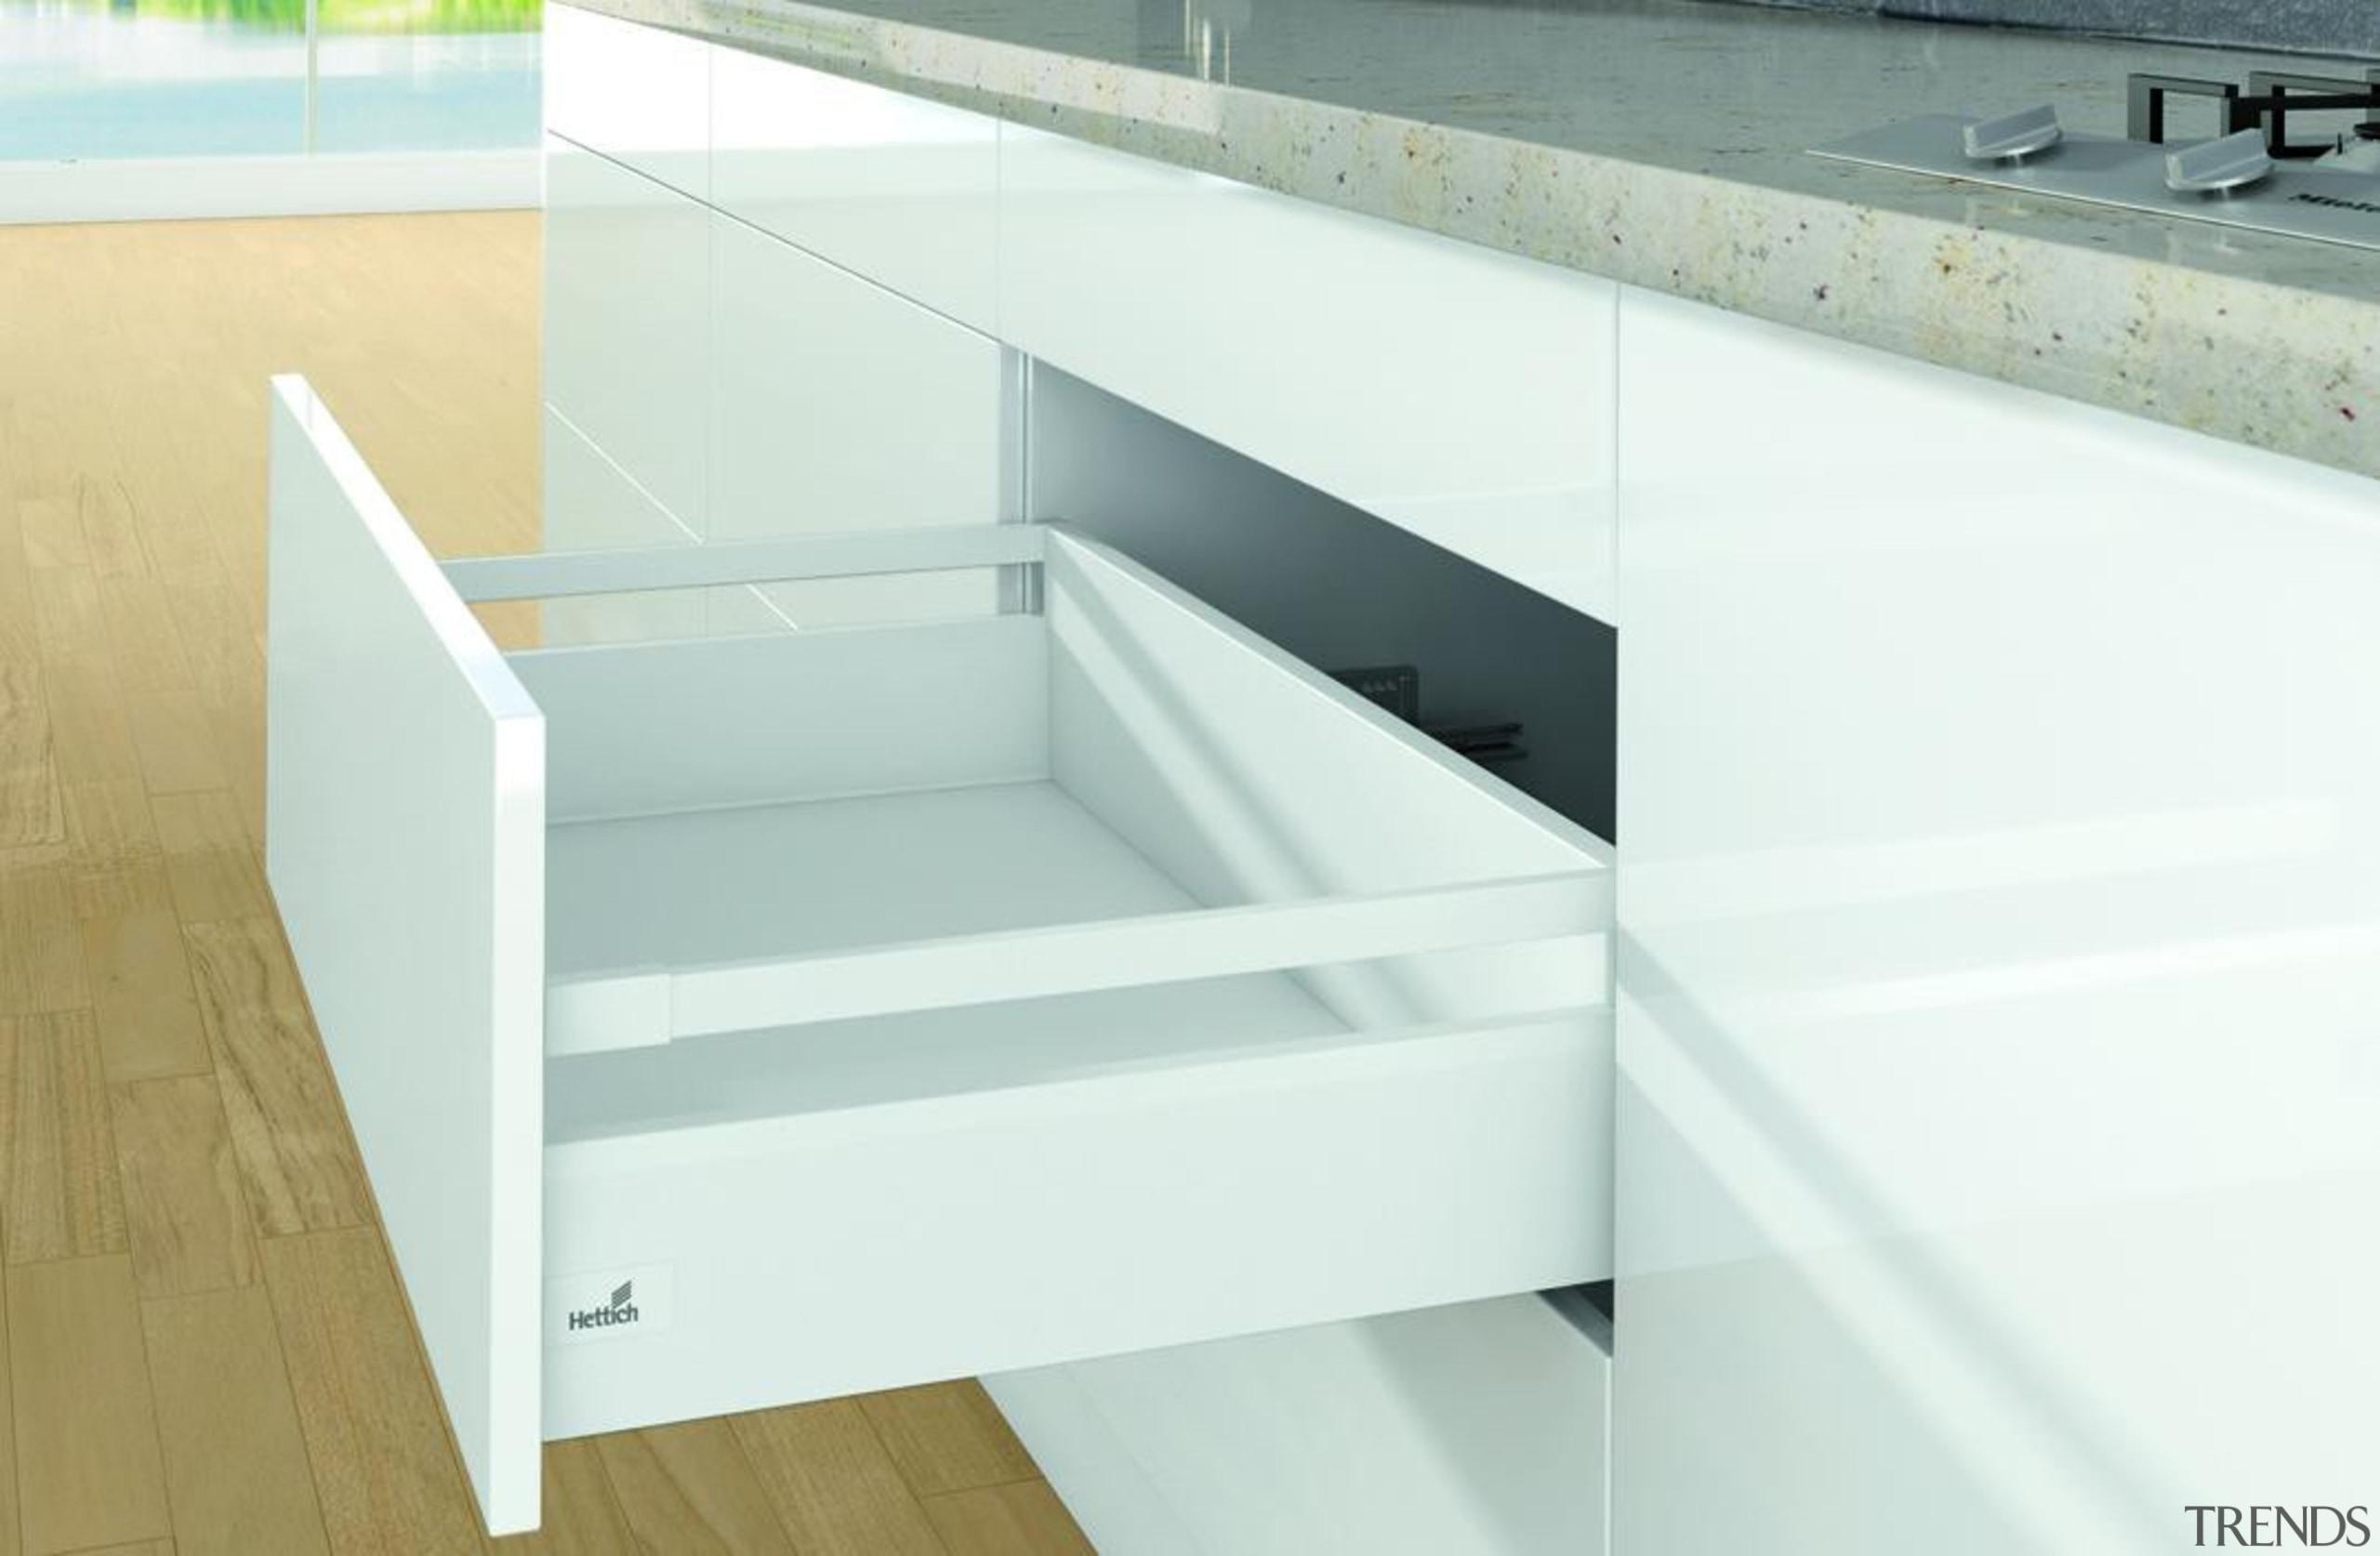 Single railing - Single railing - bathroom sink bathroom sink, drawer, furniture, glass, product, product design, sink, tap, white